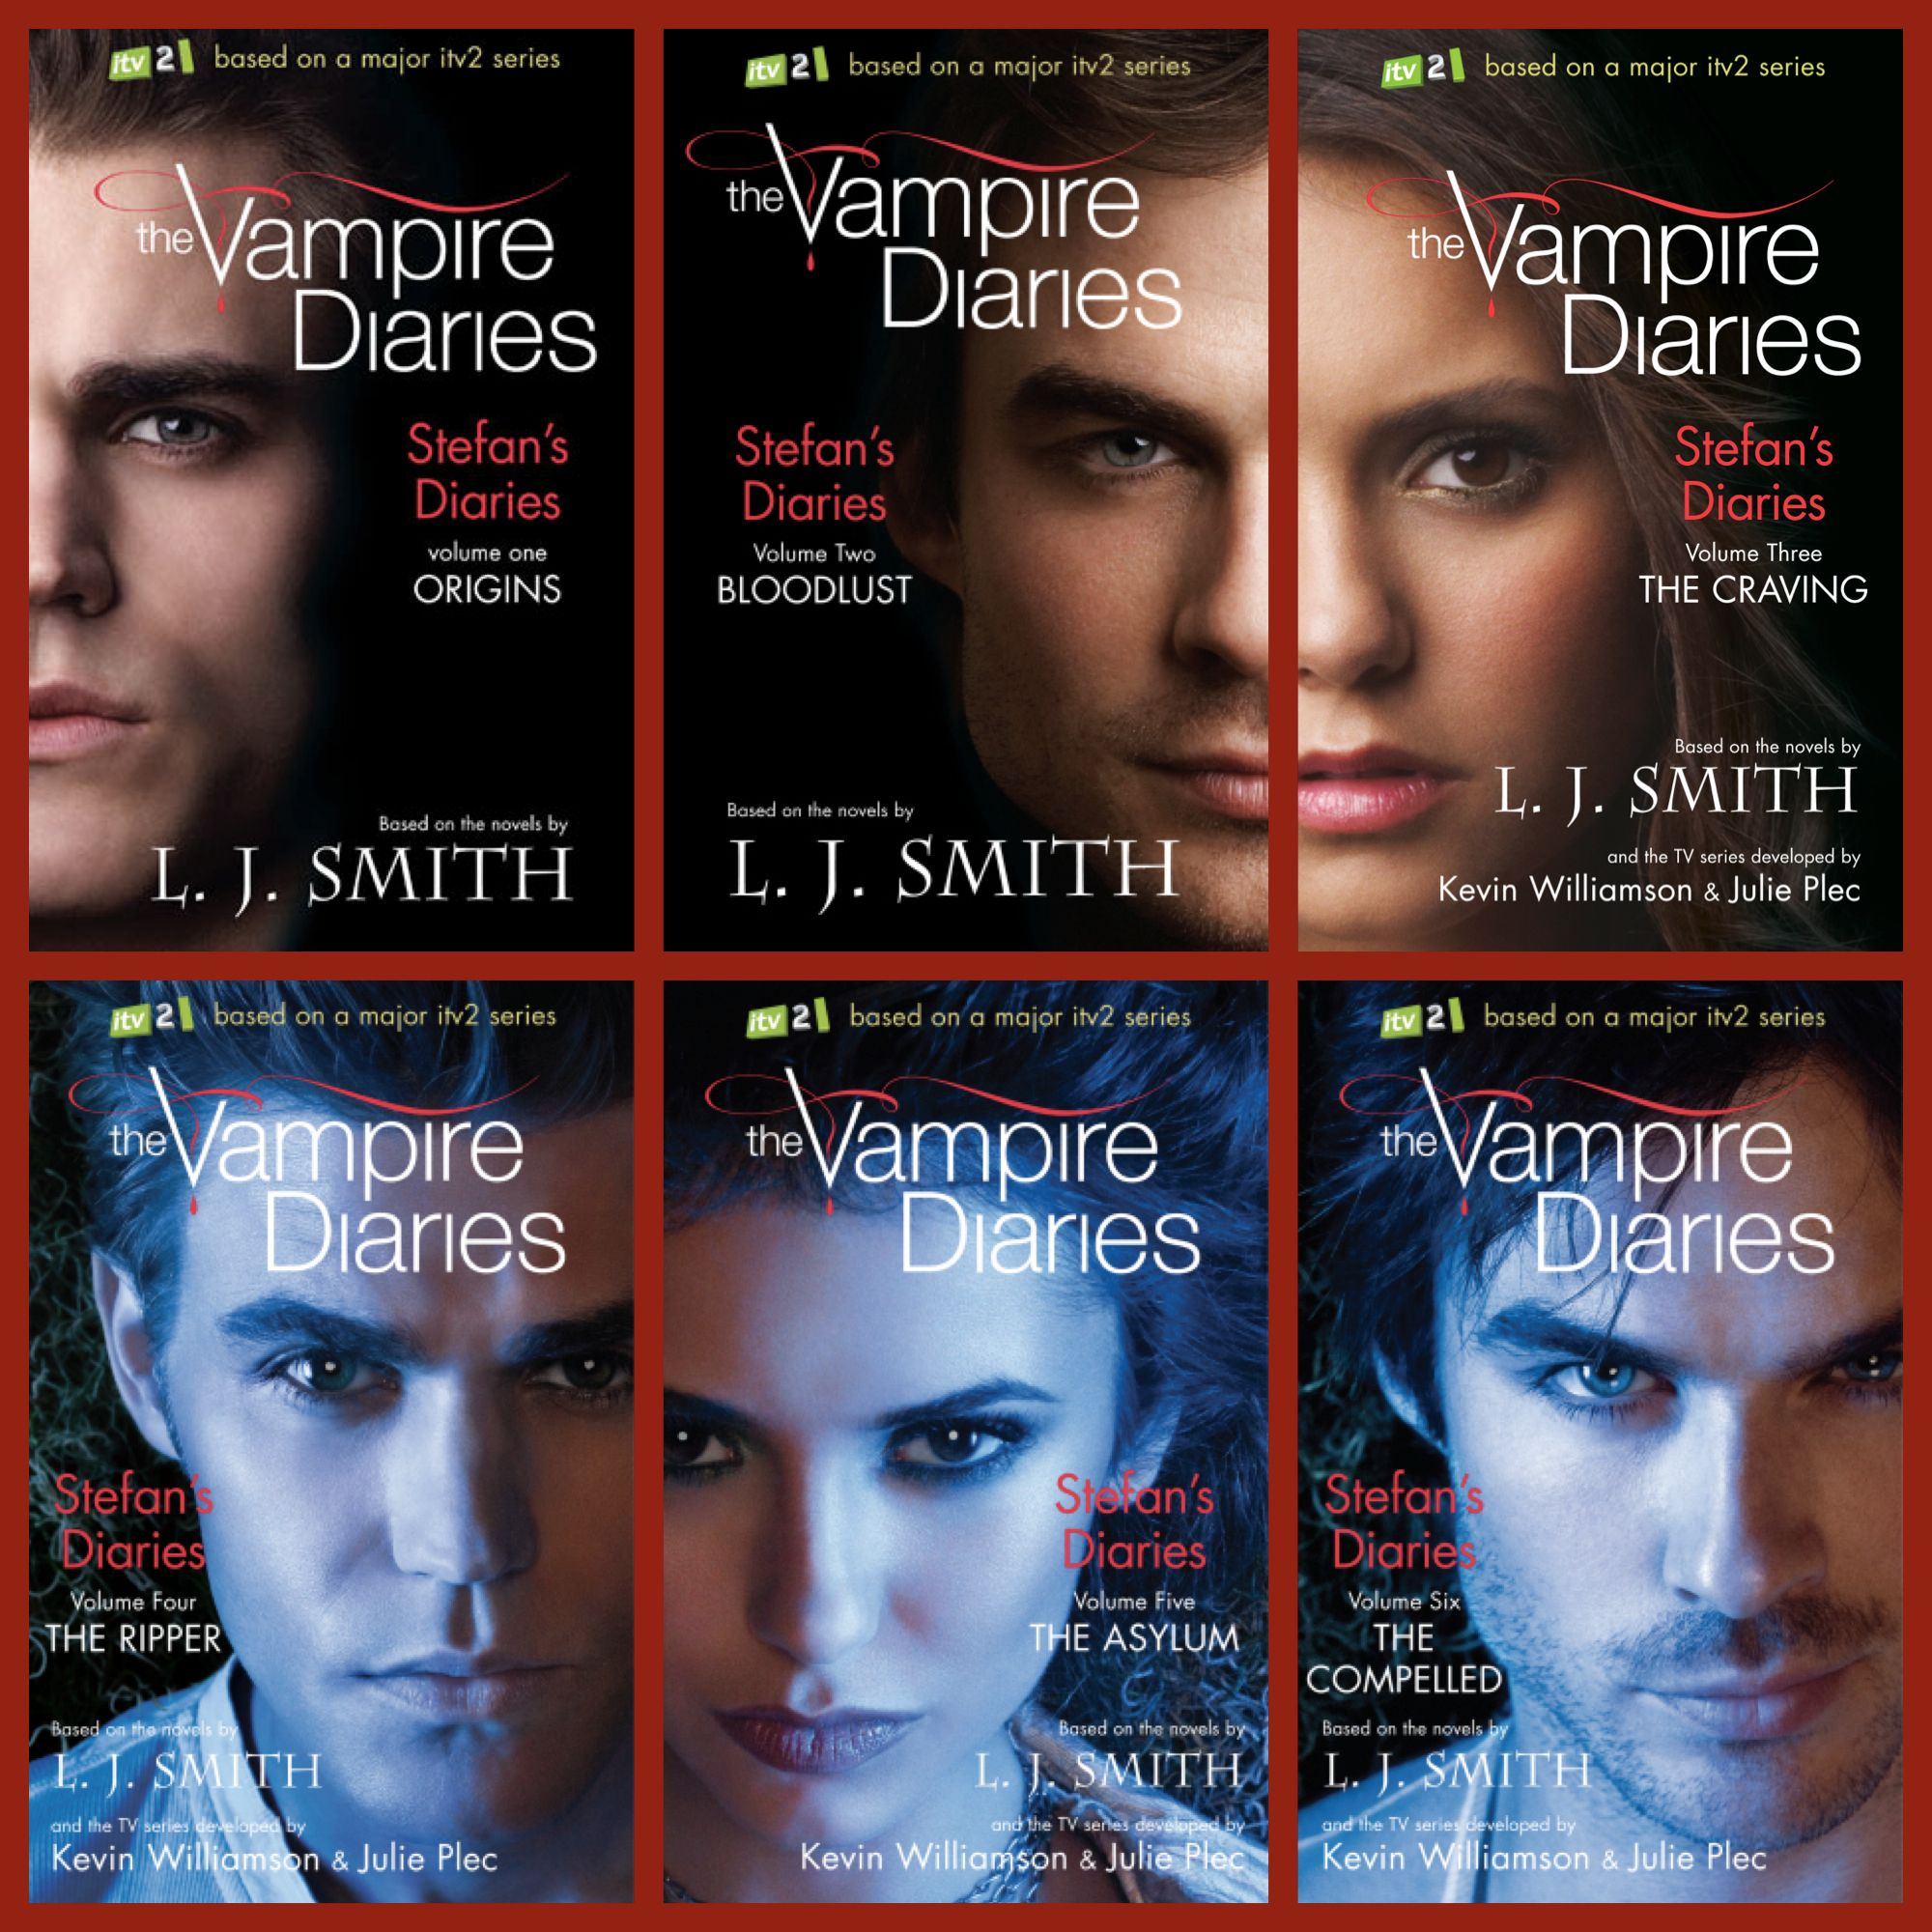 The Vampire Diaries Book Series